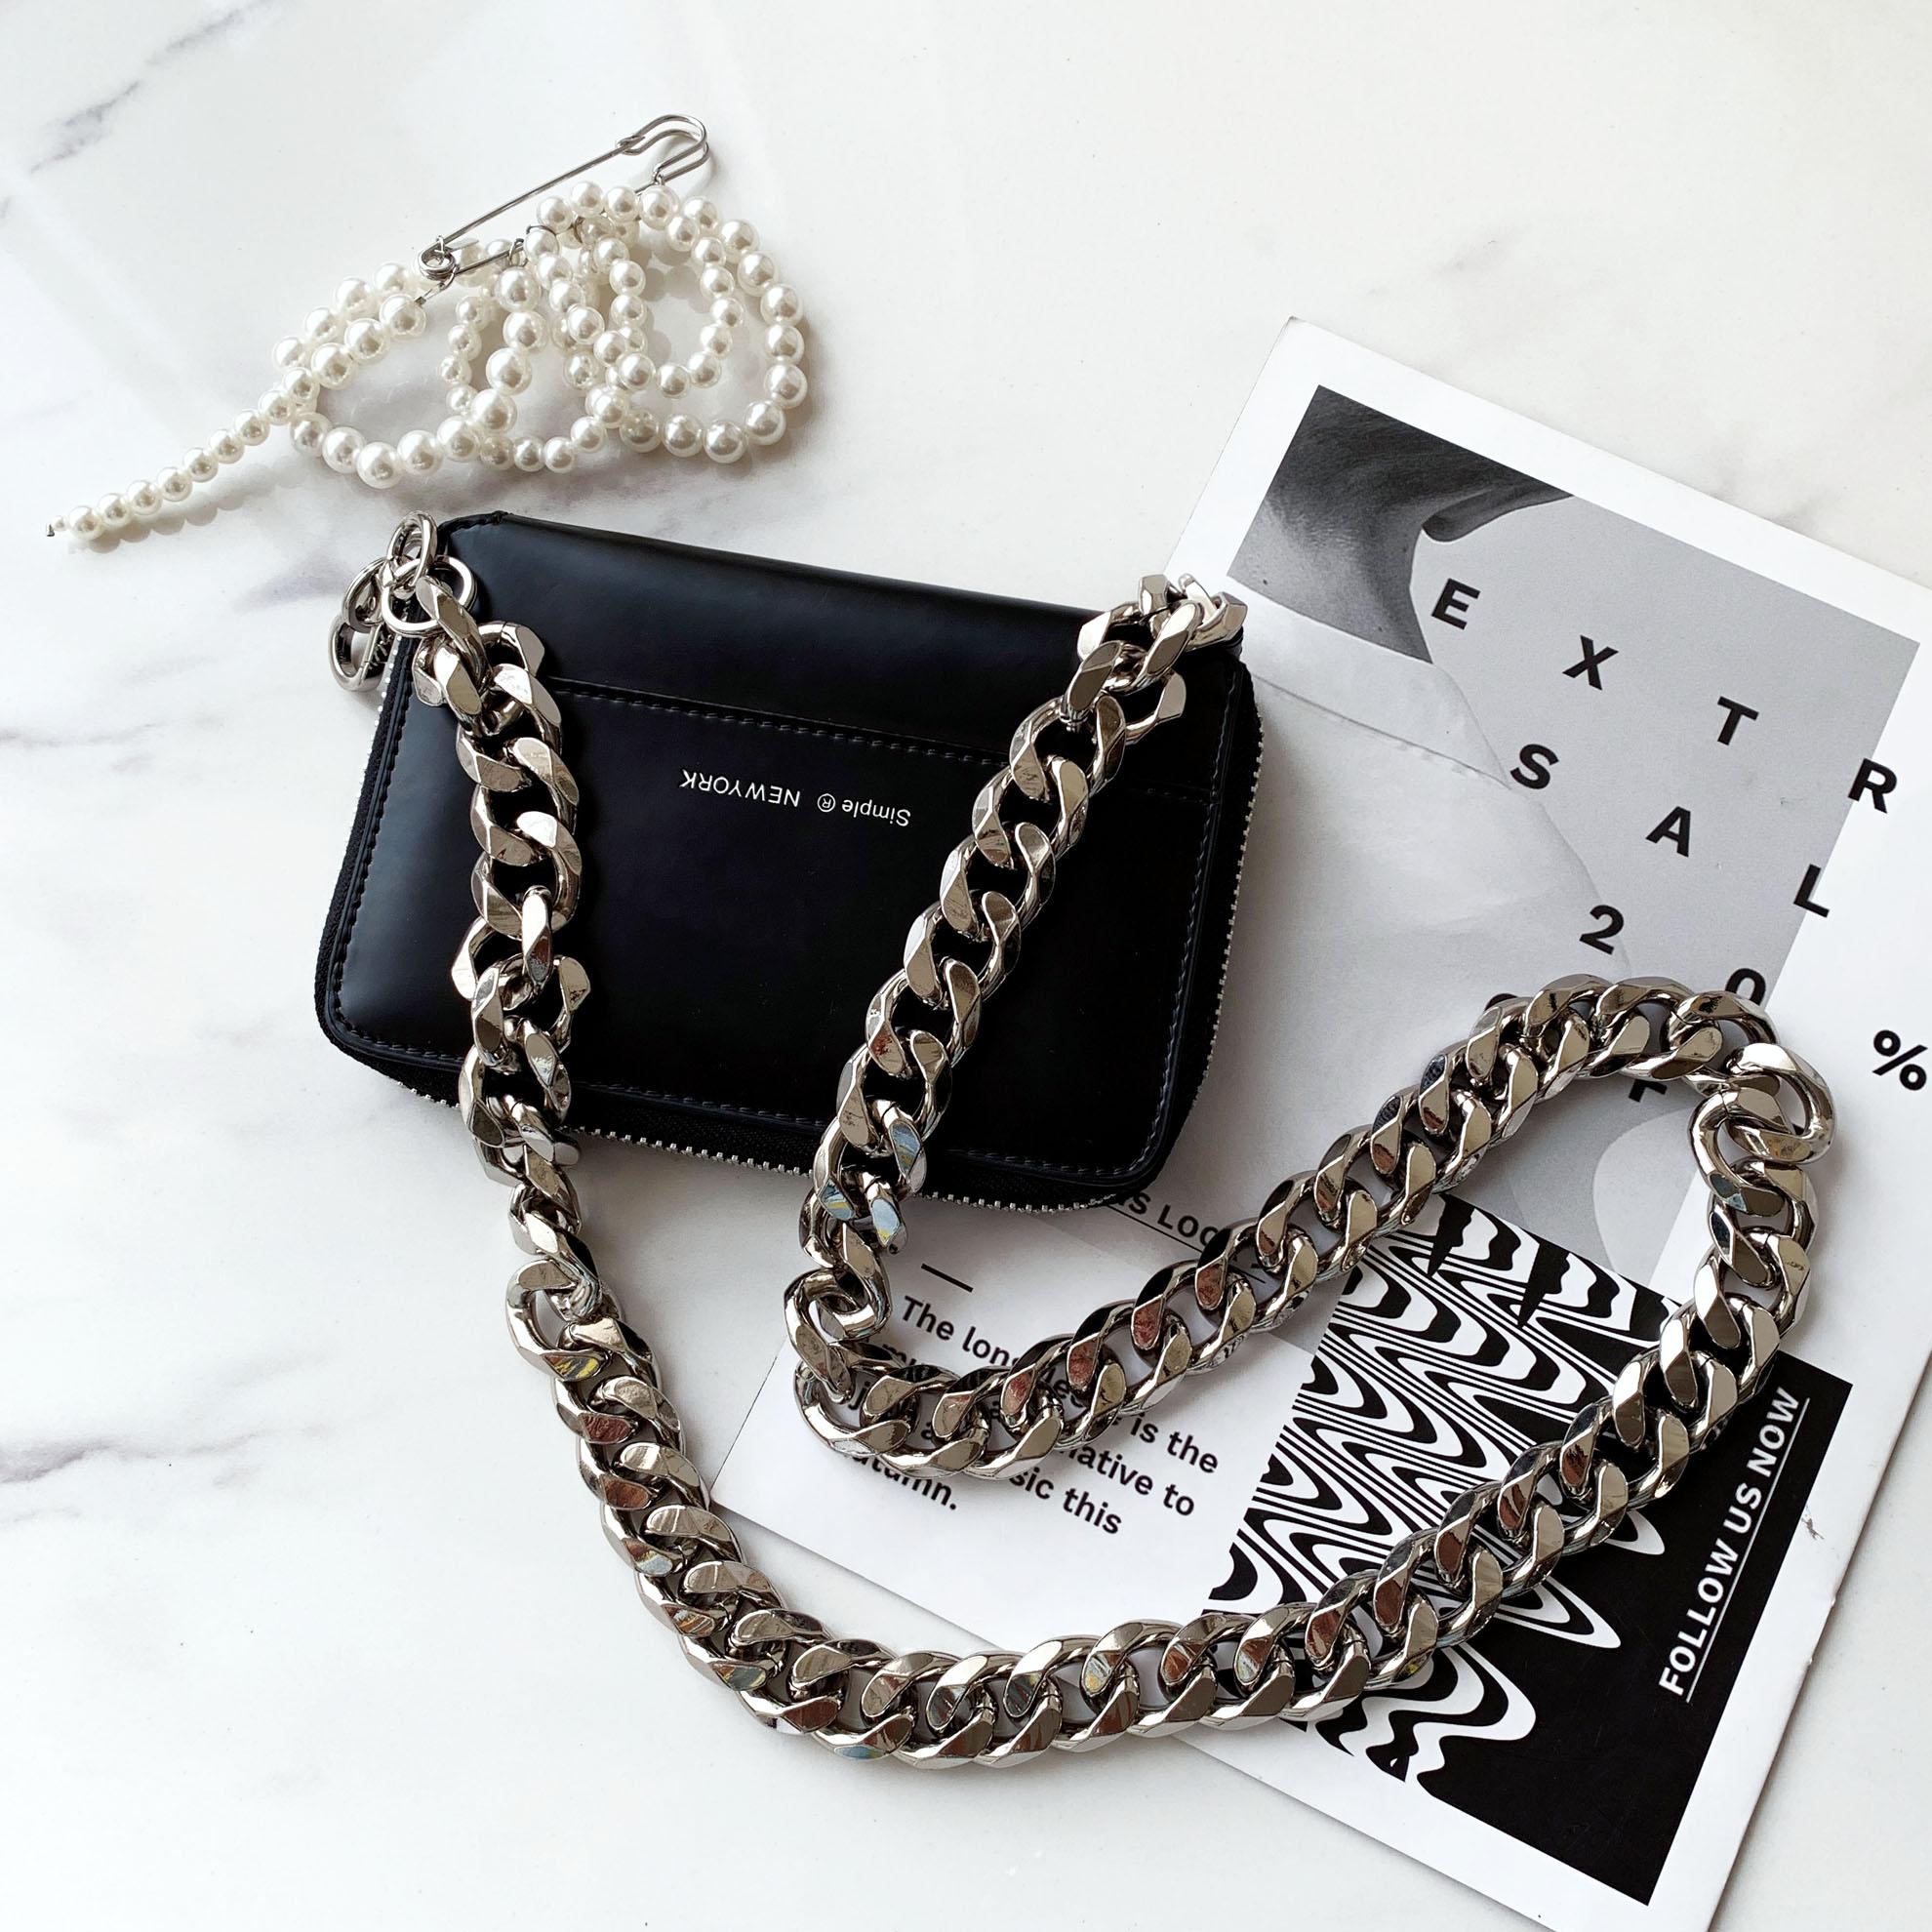 Black Wallet Women Thick Chain Belt Shoulder Bags Mini Lipstick Pocket Fashion Crossbody Messenger Bags Women Handbag And Purse